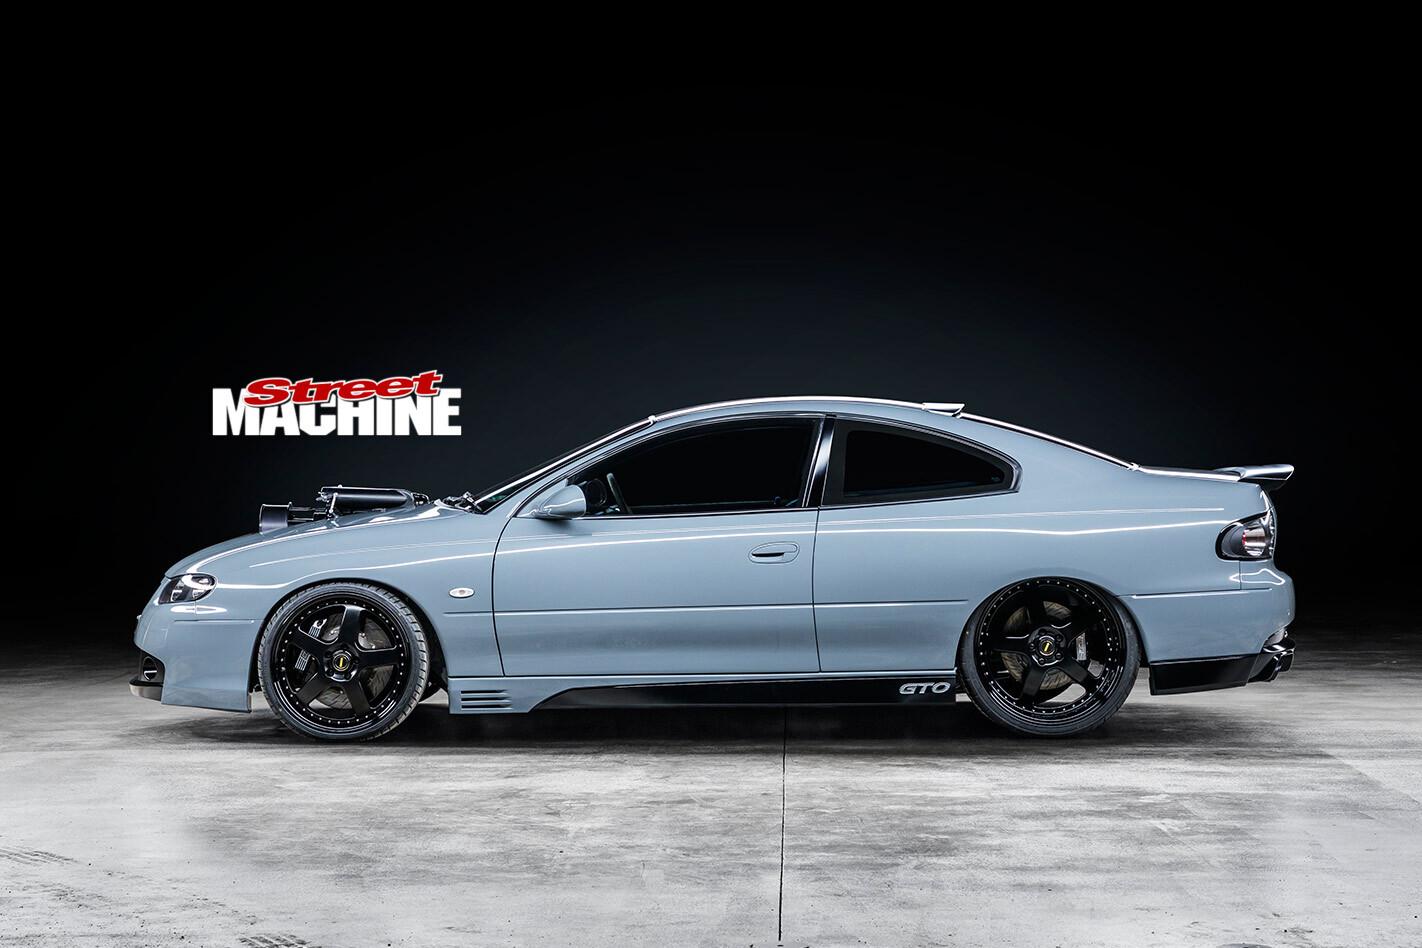 HSV GTO side